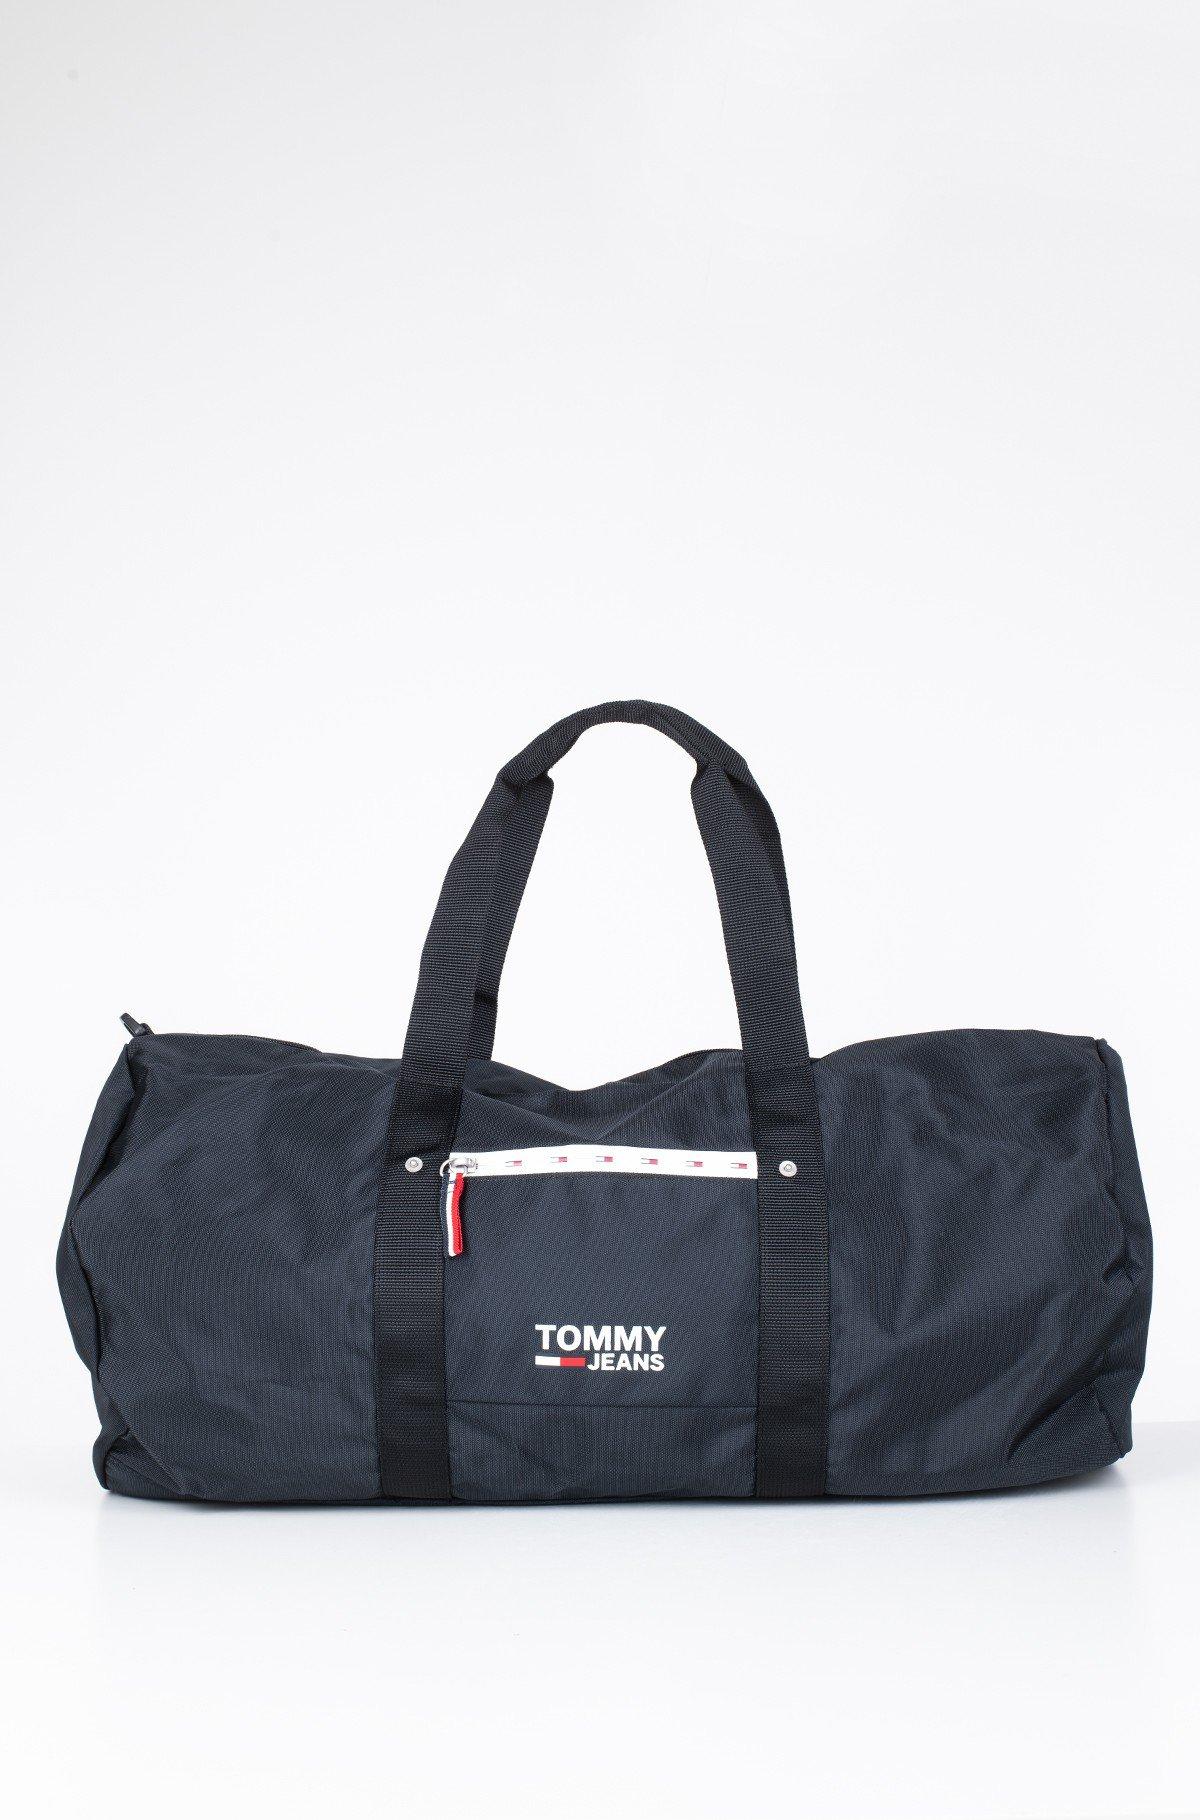 Kelionių krepšys TJM COOL CITY DUFFLE-full-1